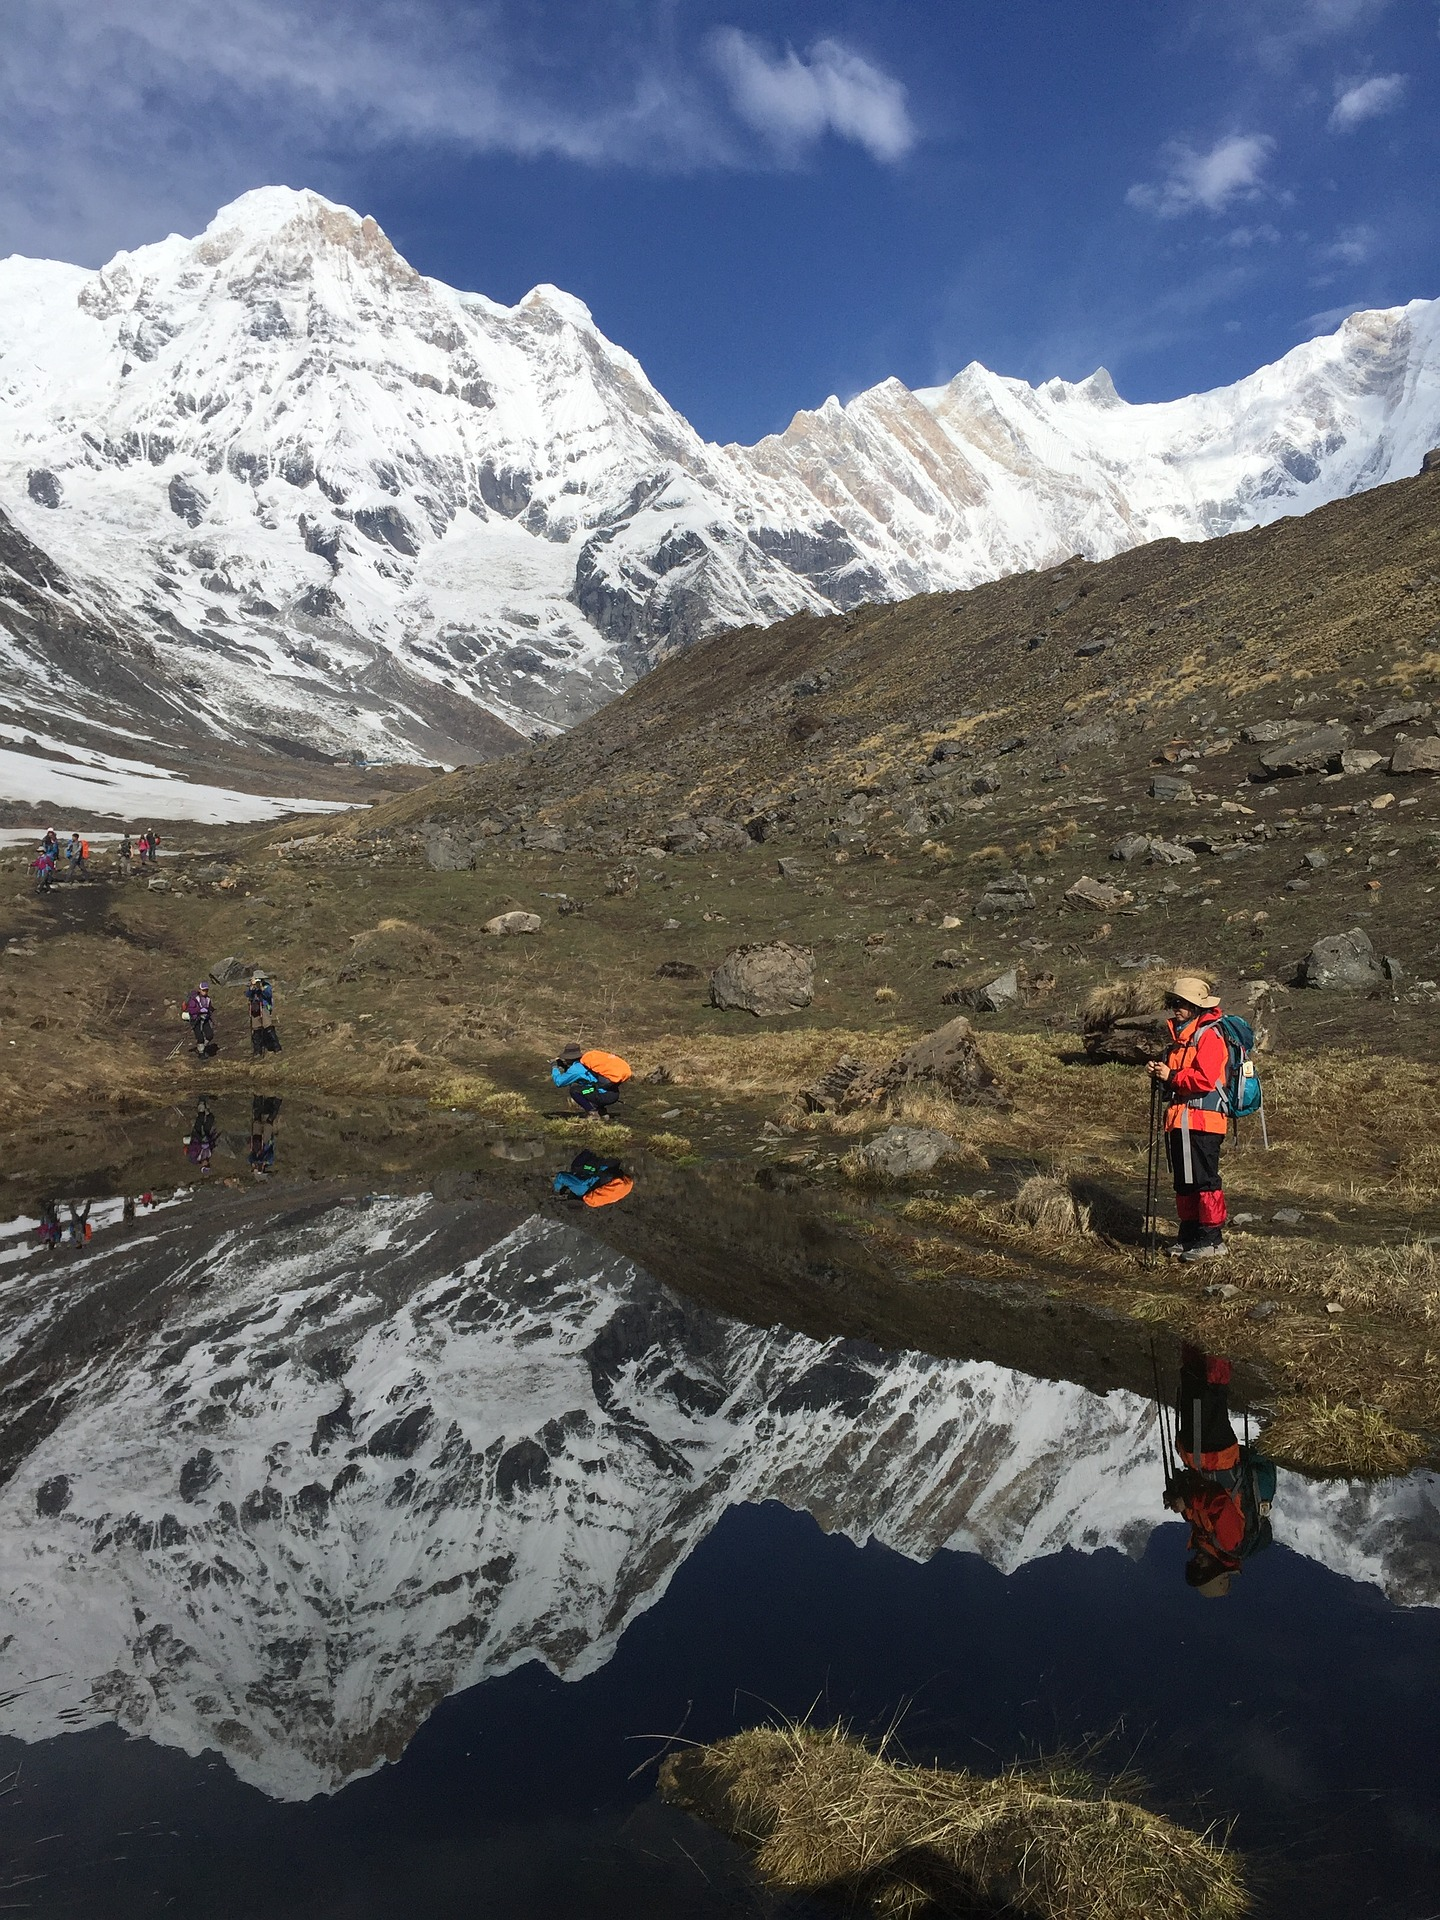 Hiking Trails: Trekking In Nepal